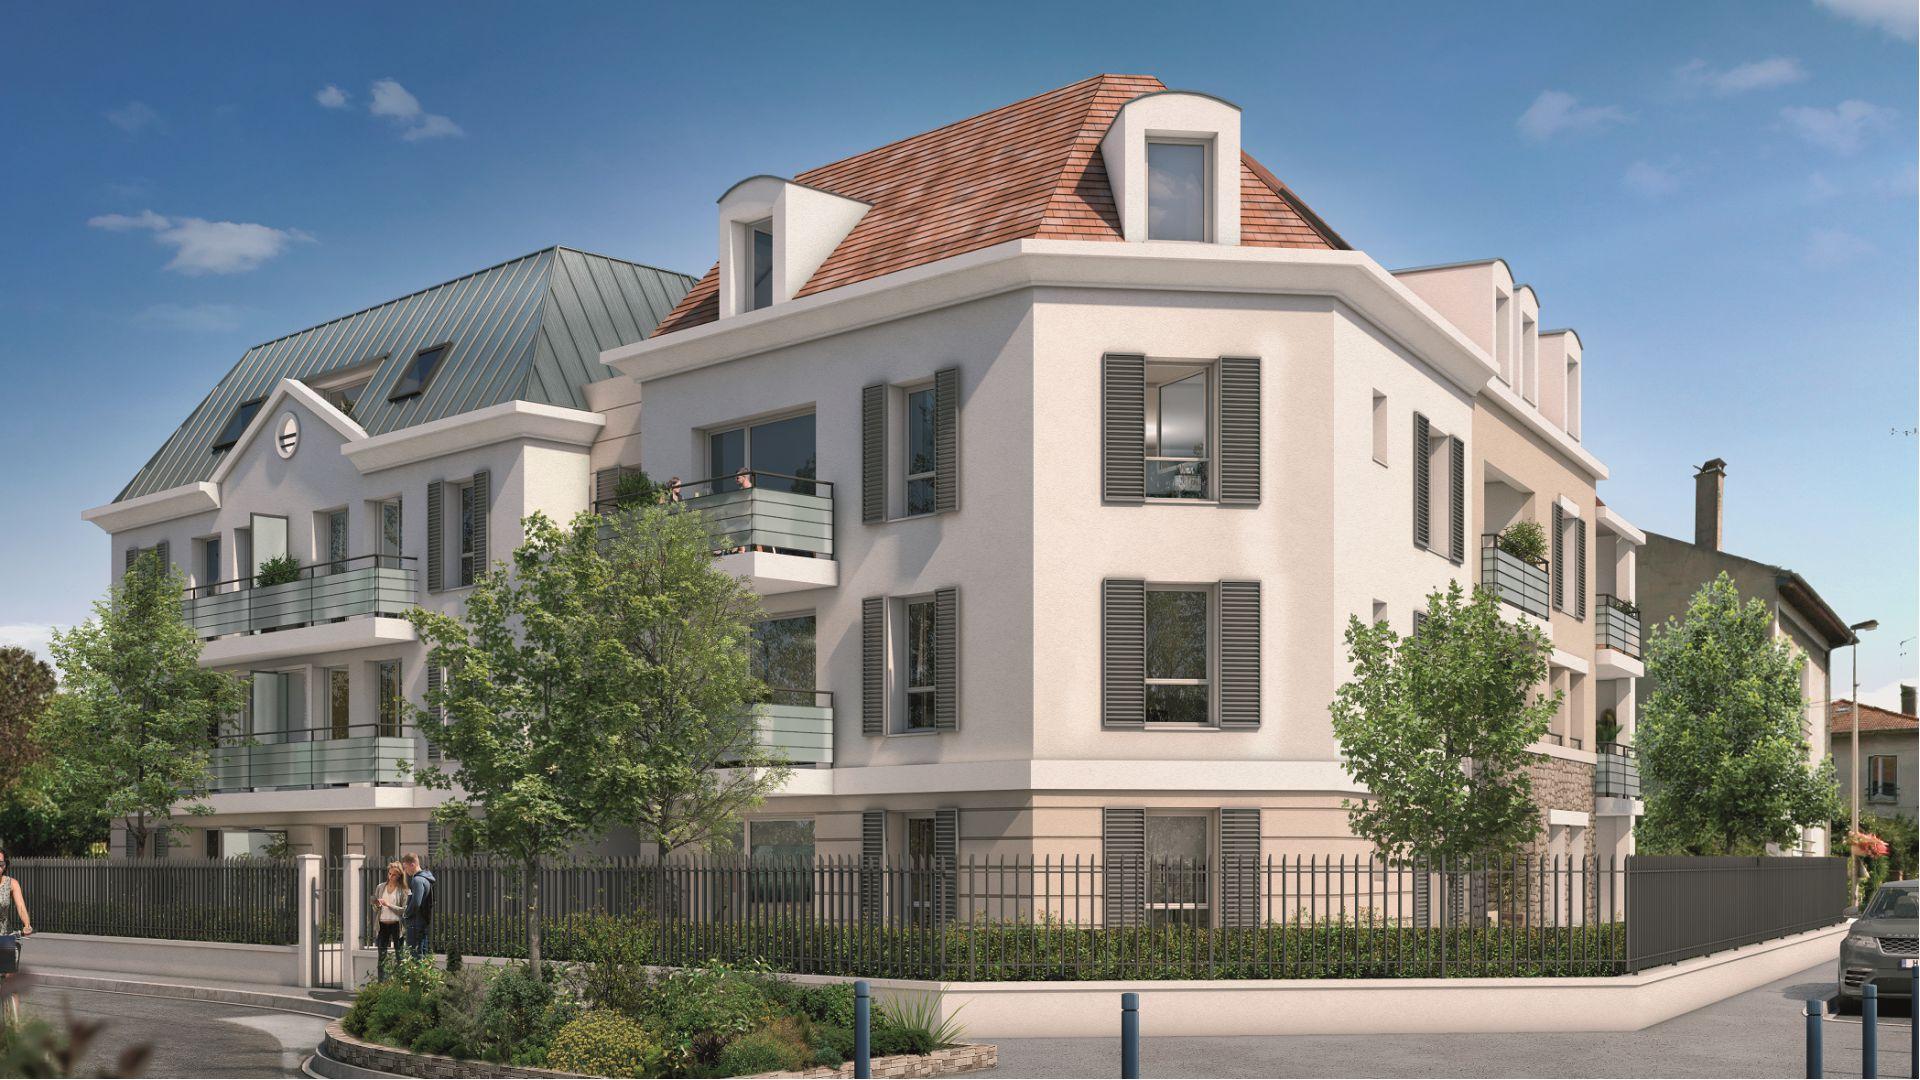 GreenCity immobilier - achat appartement  neuf - Villemomble - 93250 - Villa Castille